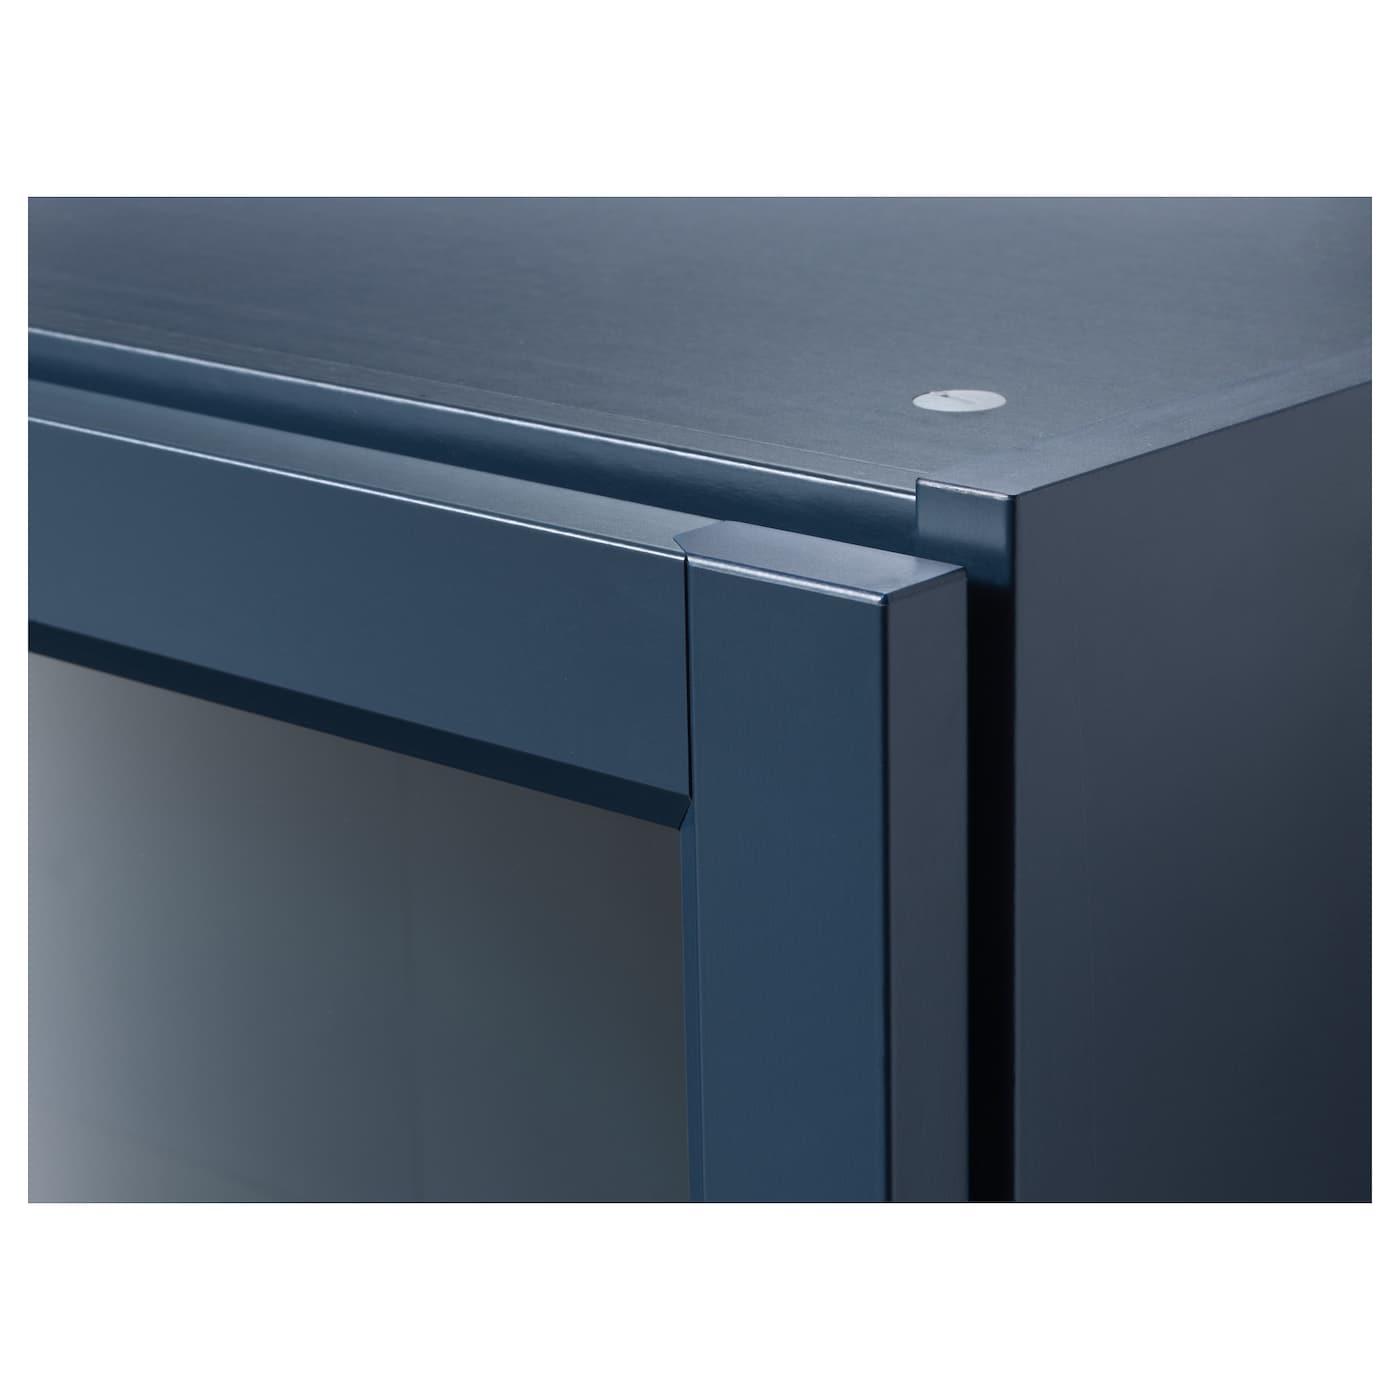 billy biblioth que vitr e bleu fonc 80x30x202 cm ikea. Black Bedroom Furniture Sets. Home Design Ideas